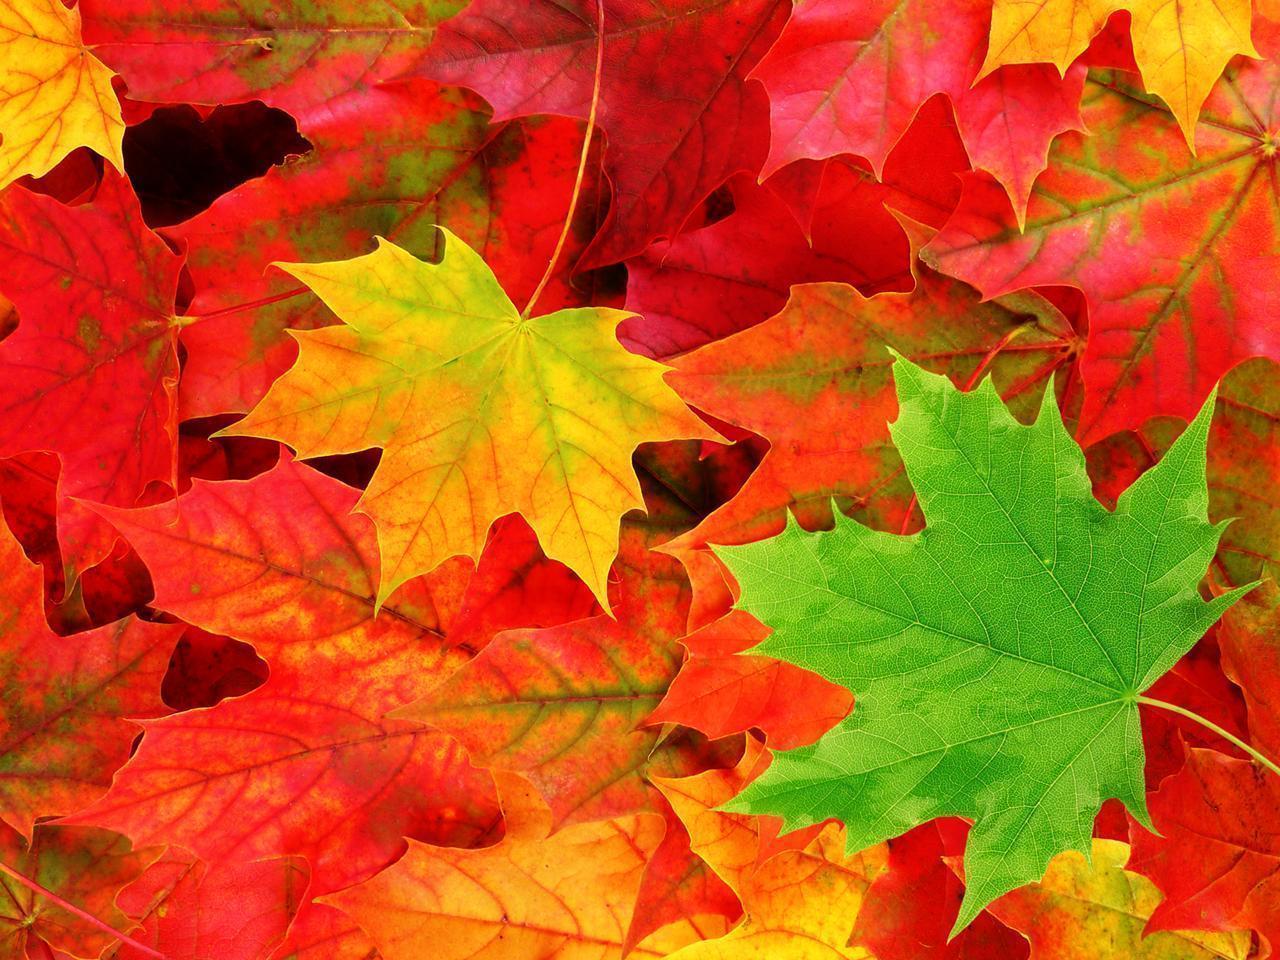 Autumn Leaves Background Tumblr